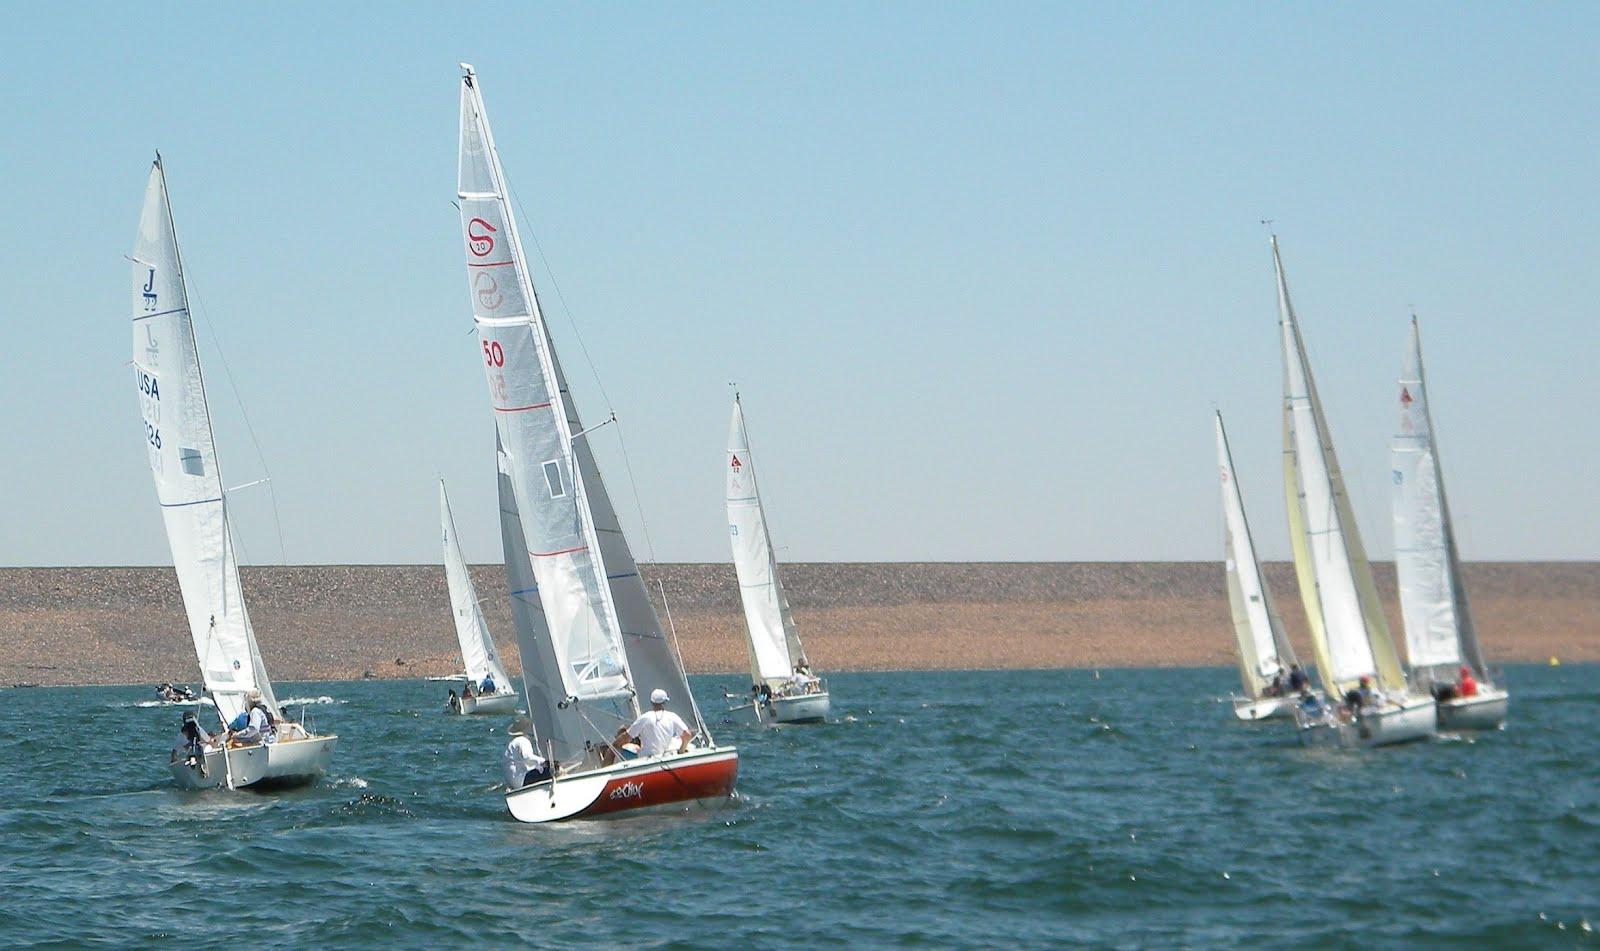 Sailingtexas Sailboats For Sale From Sailing Texas Buy